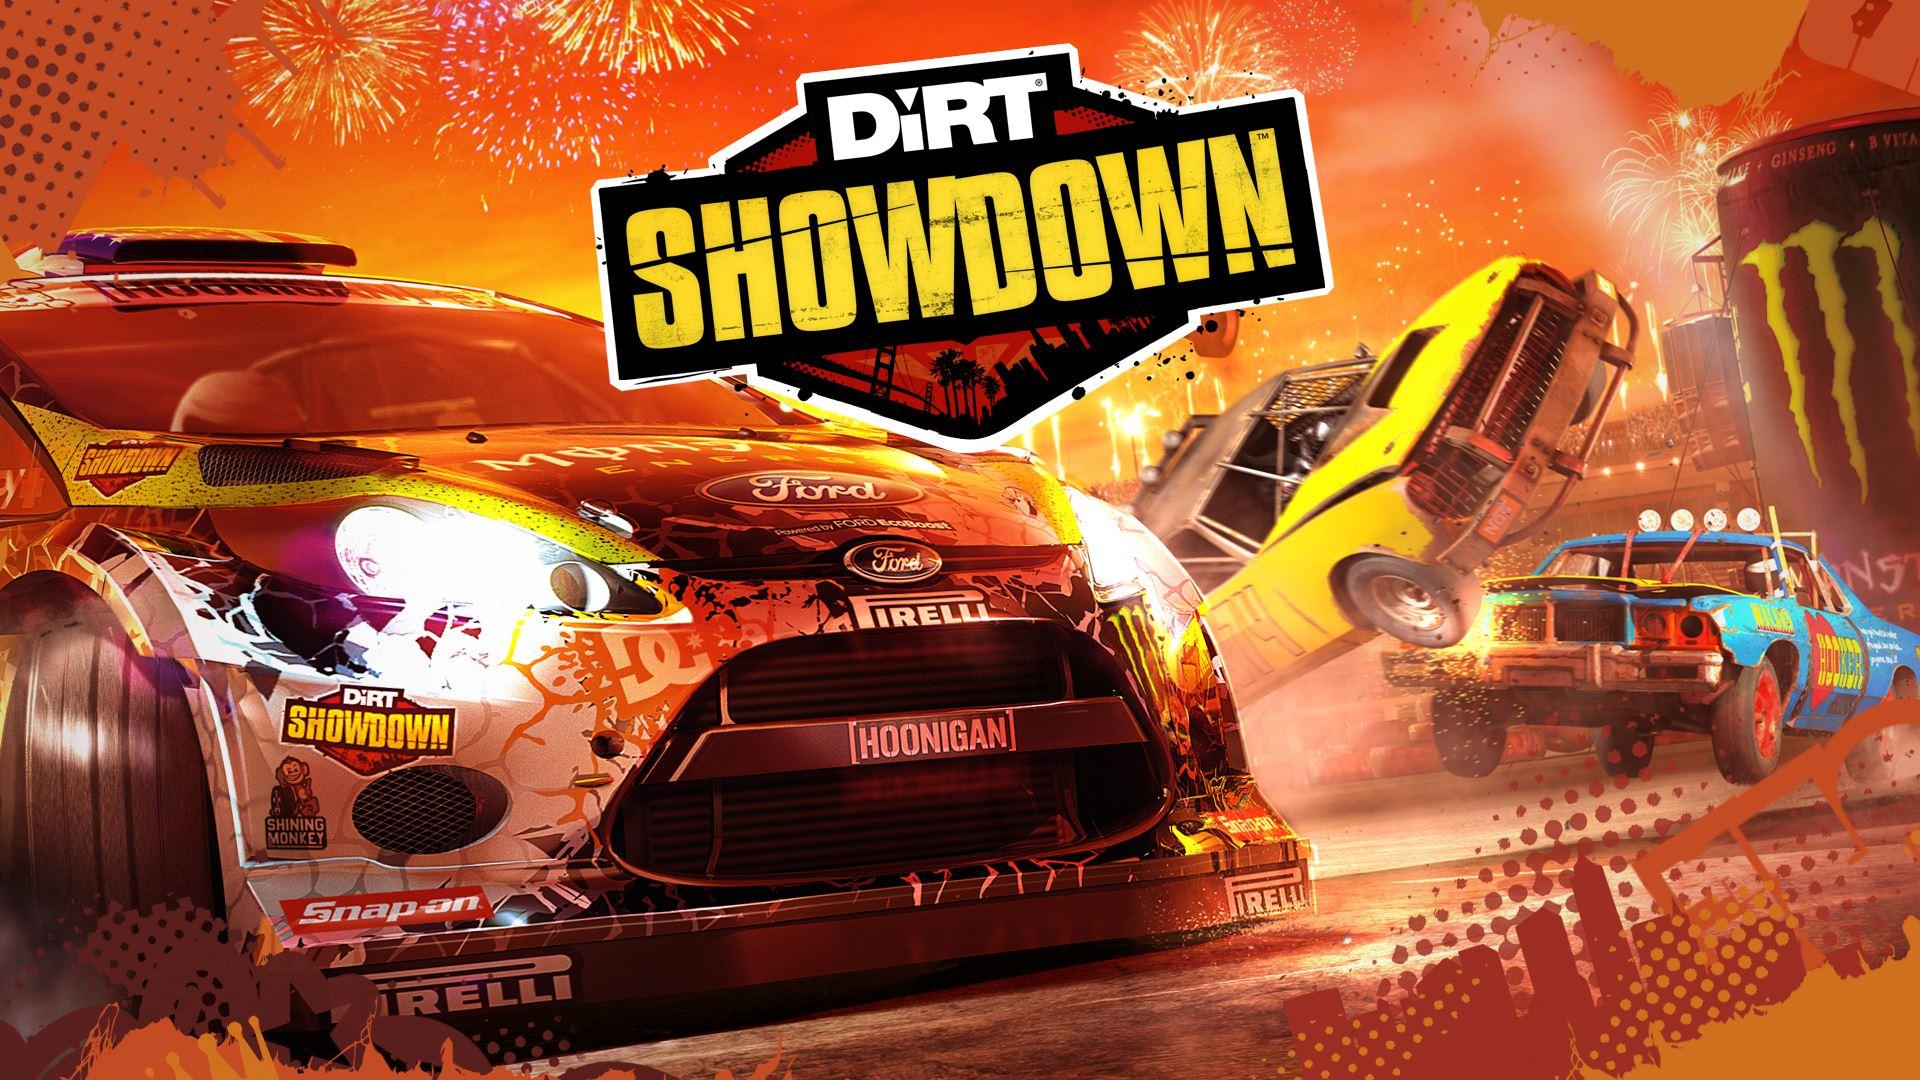 Photo of Free Steam Key – Dirt Showdown gratuit pentru Steam, oferta limitata!